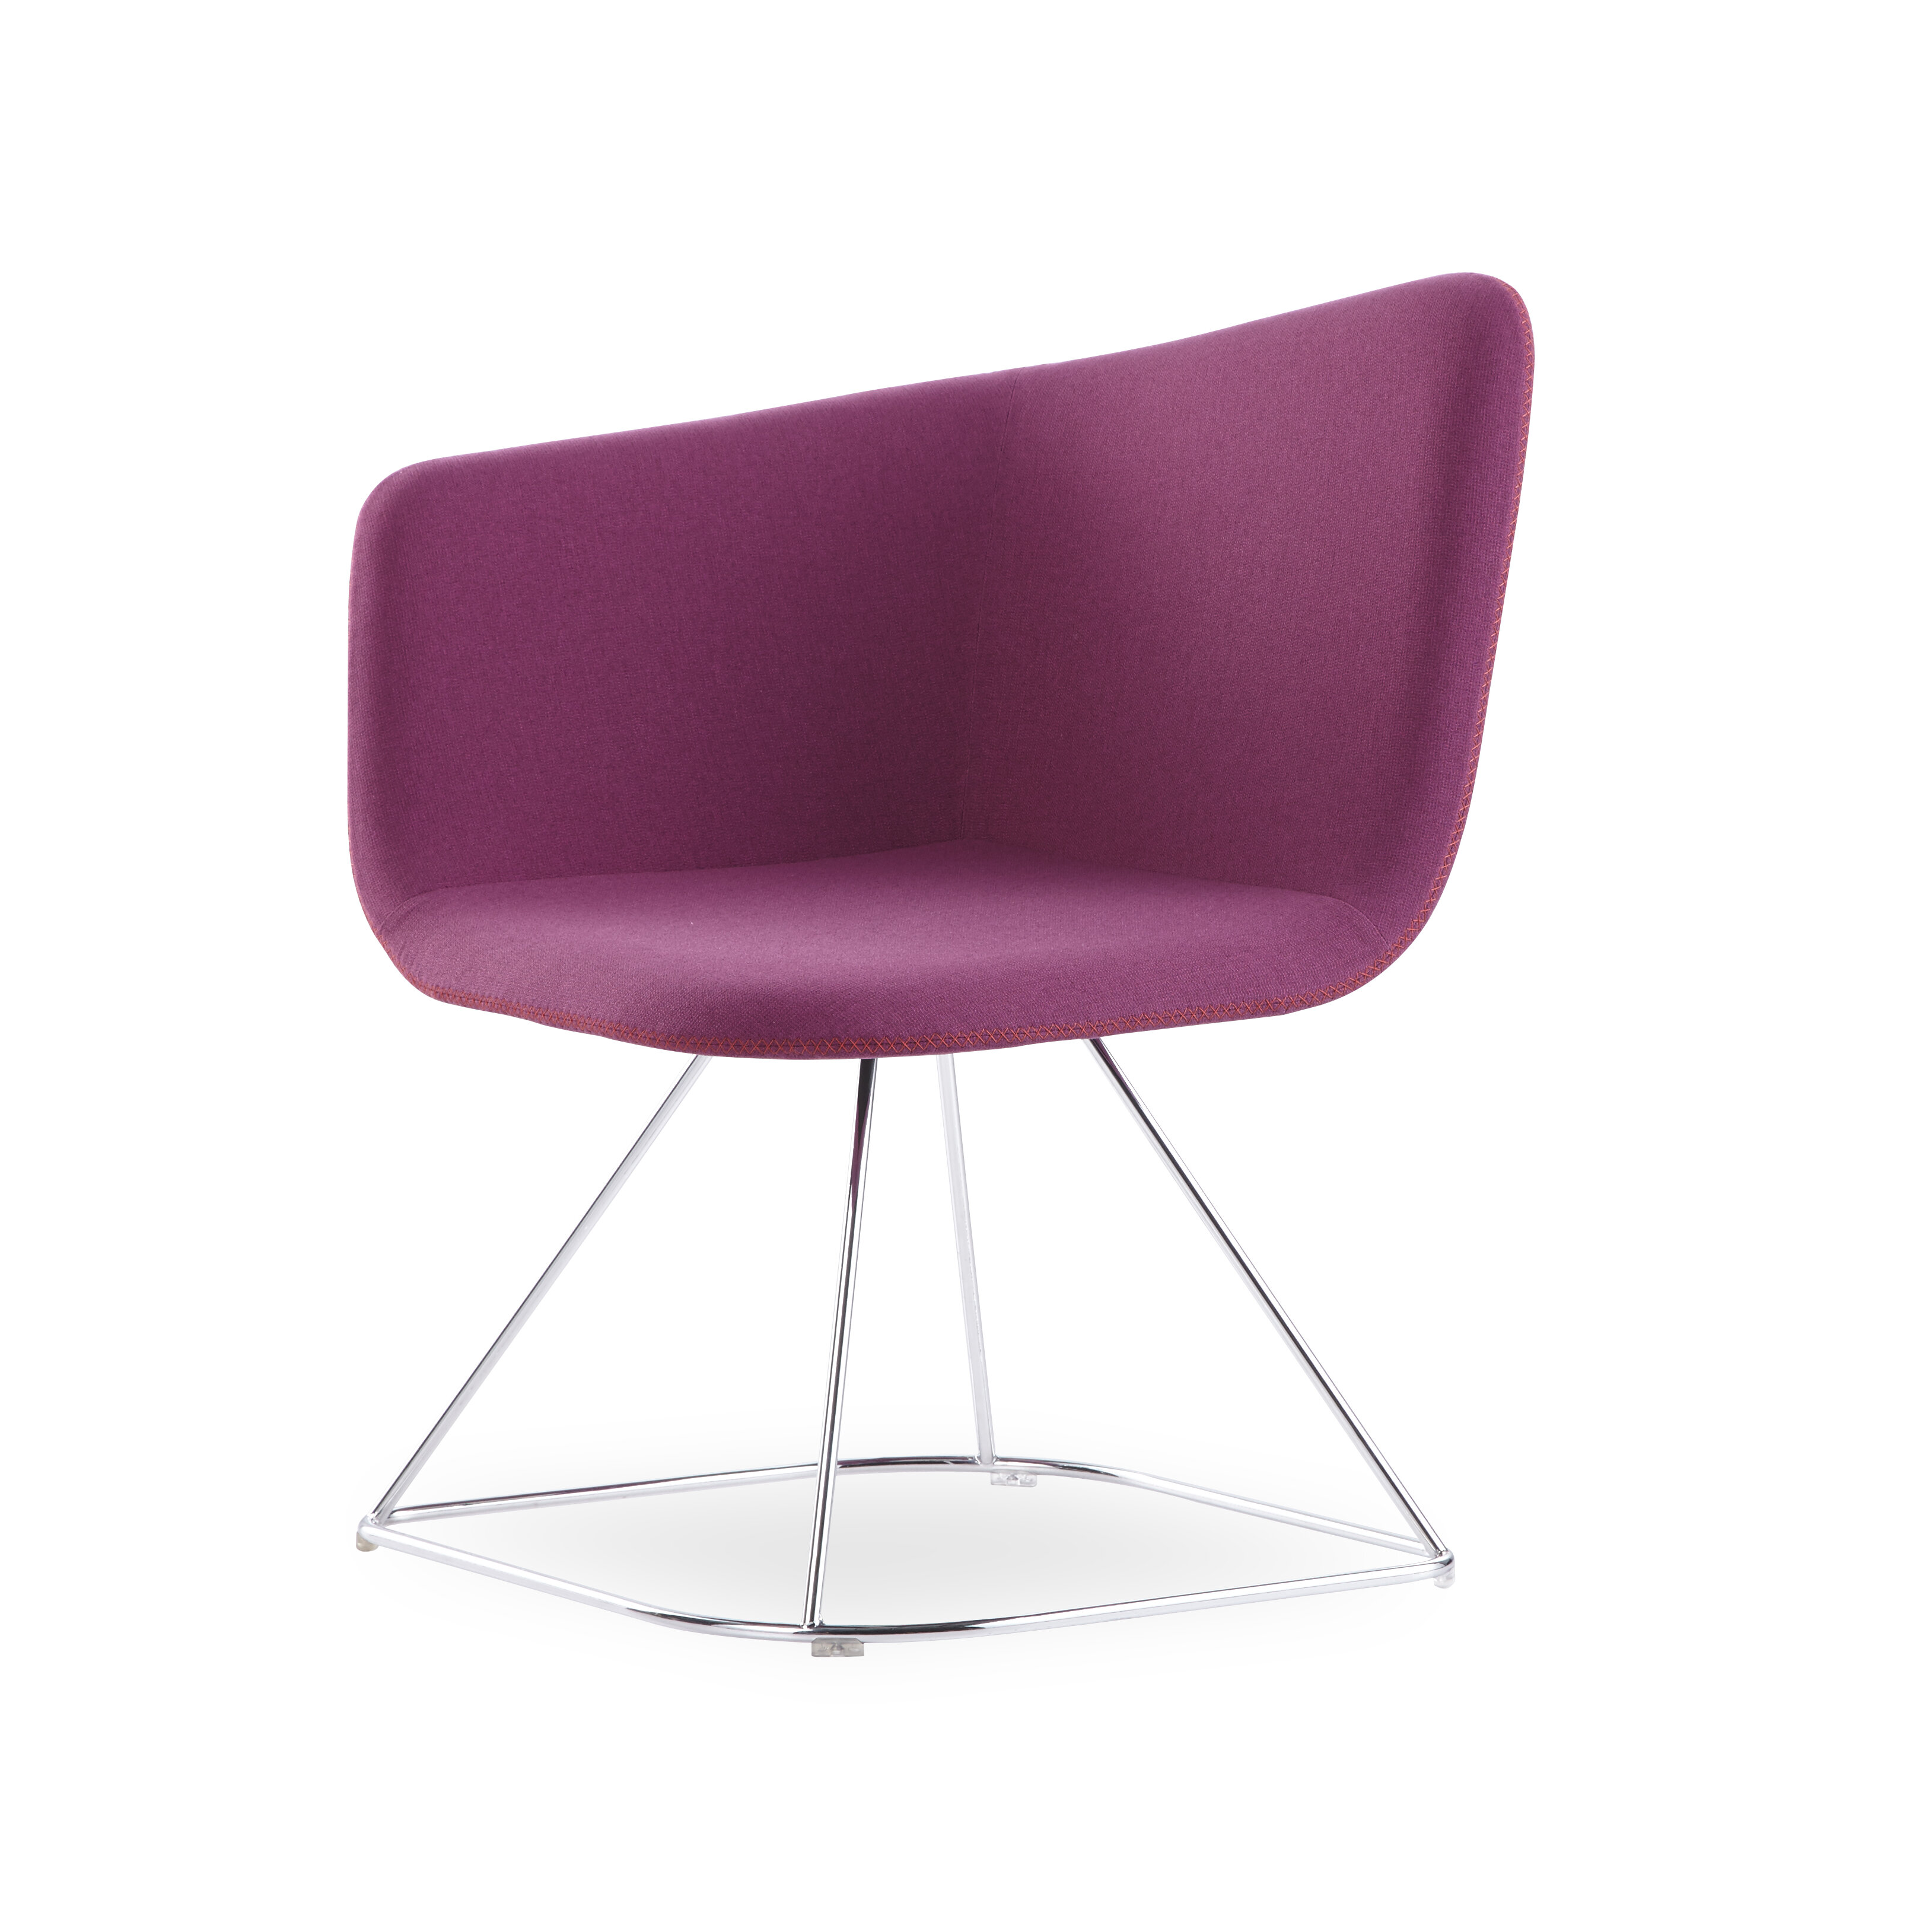 Remarkable Ehmann Swivel Guest Chair Theyellowbook Wood Chair Design Ideas Theyellowbookinfo